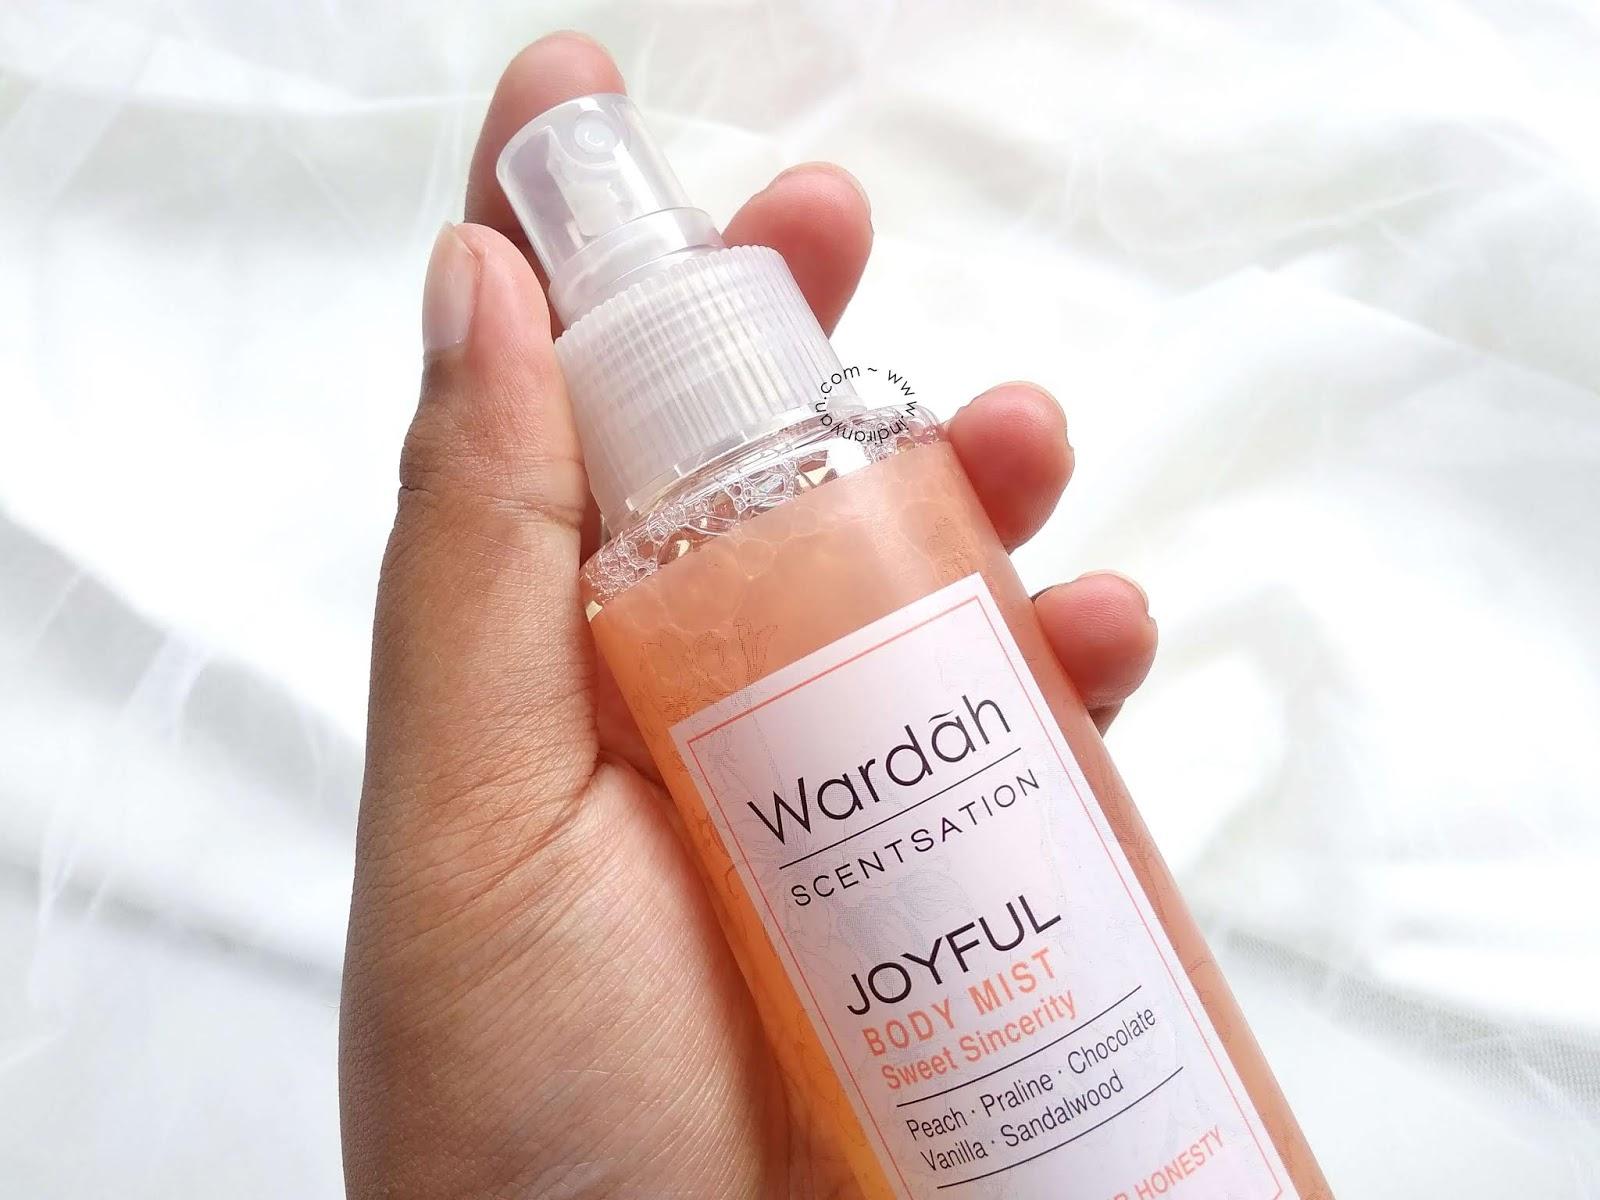 wardah-scentsation-body-mist-joyful